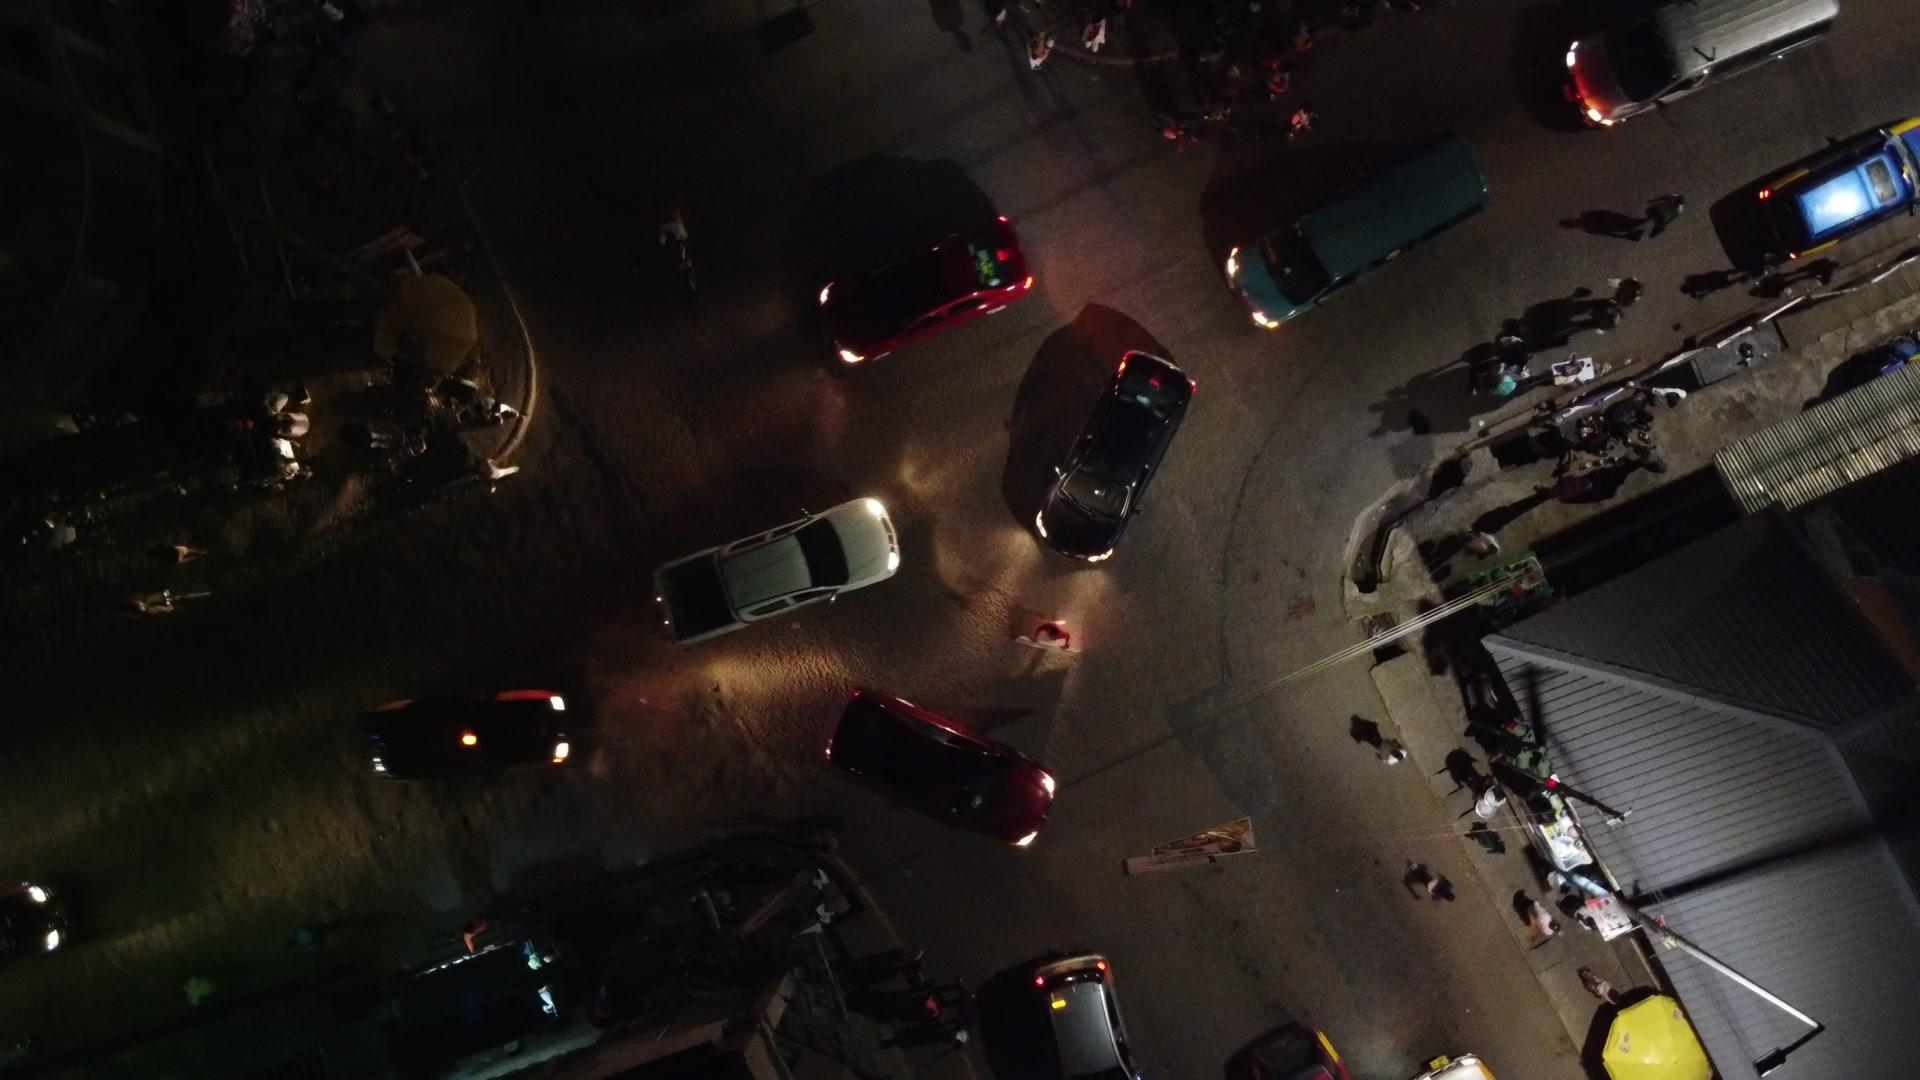 Koforidua Top Down View Intersection Cars Traffic Light Night Reveal Township